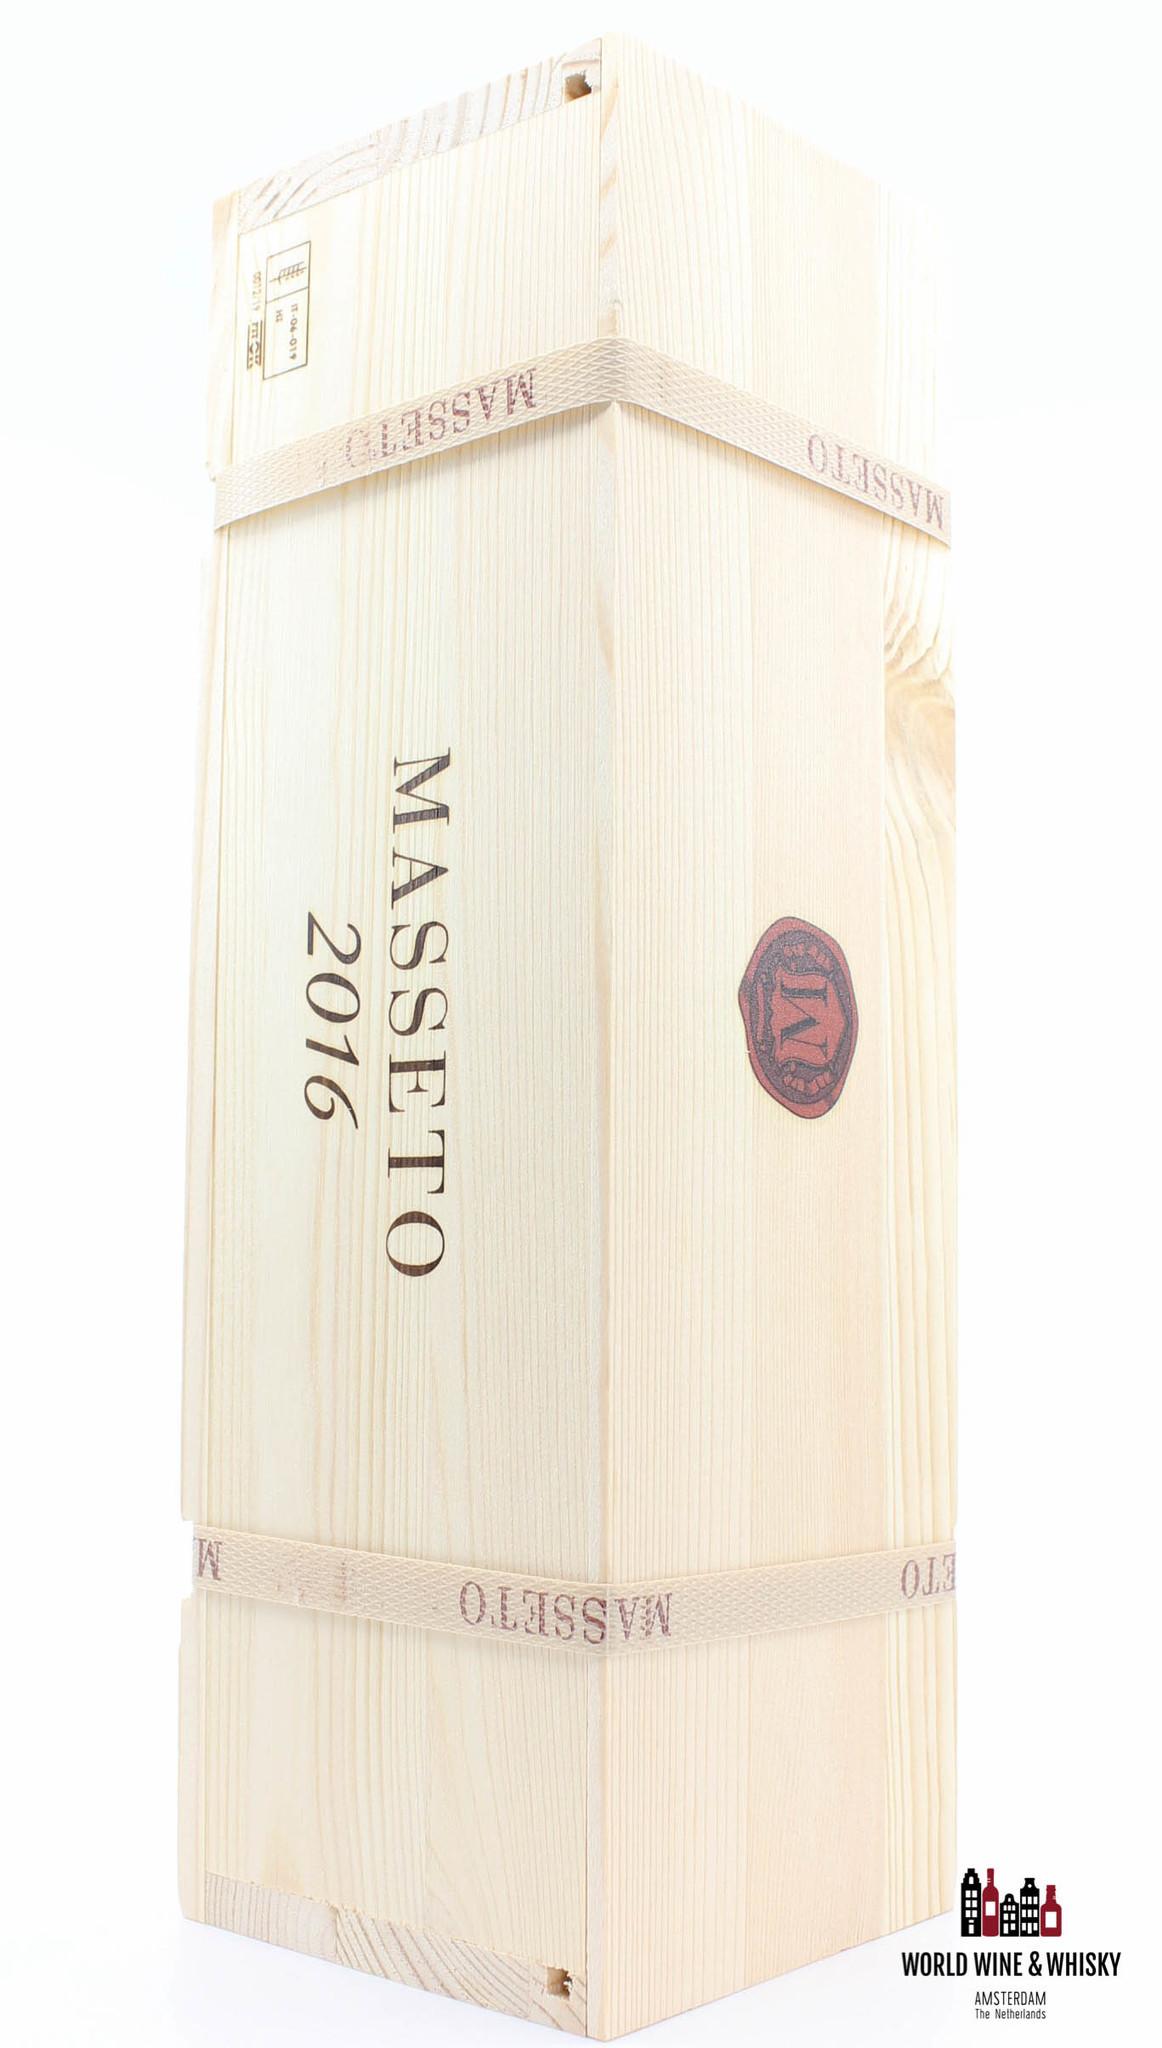 Masseto Tenuta dell Ornellaia Masseto 2016 (1-bottle OWC)